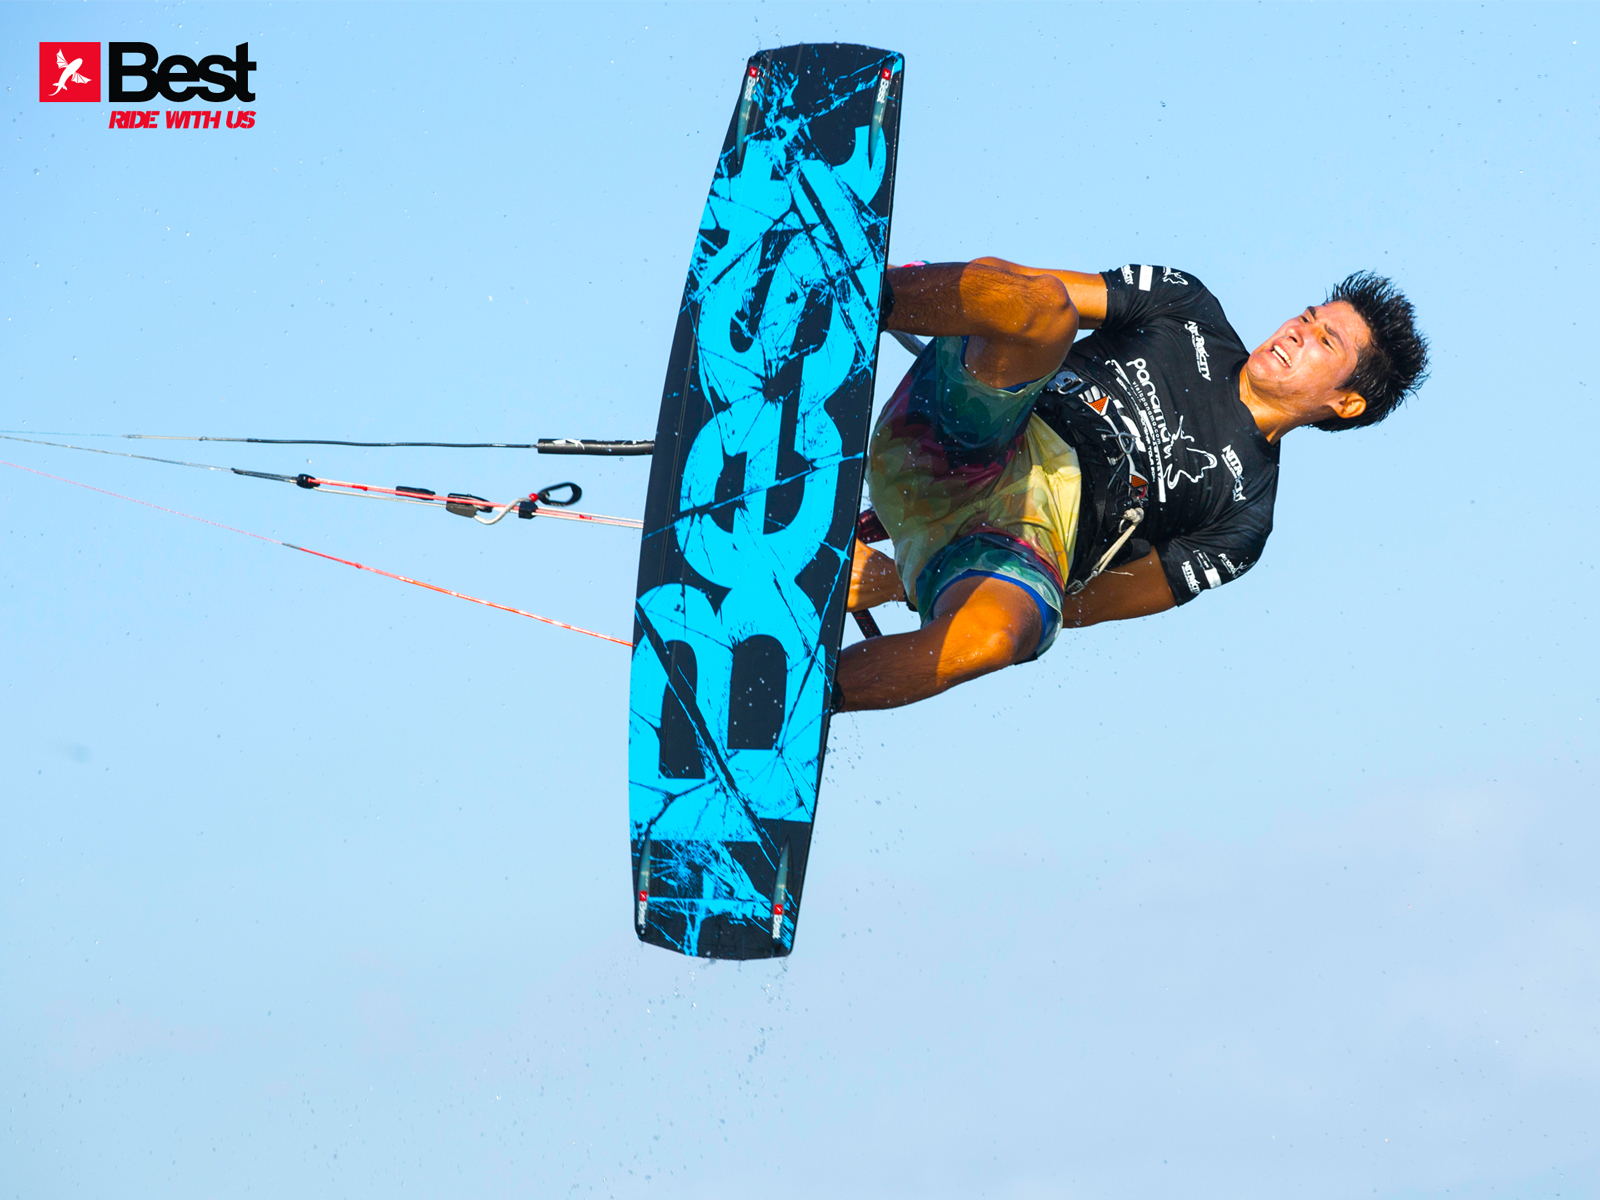 kitesurf wallpaper image - Alexandre Neto handle passing on the Best kiteboarding gear - in resolution: Standard 4:3 1600 X 1200